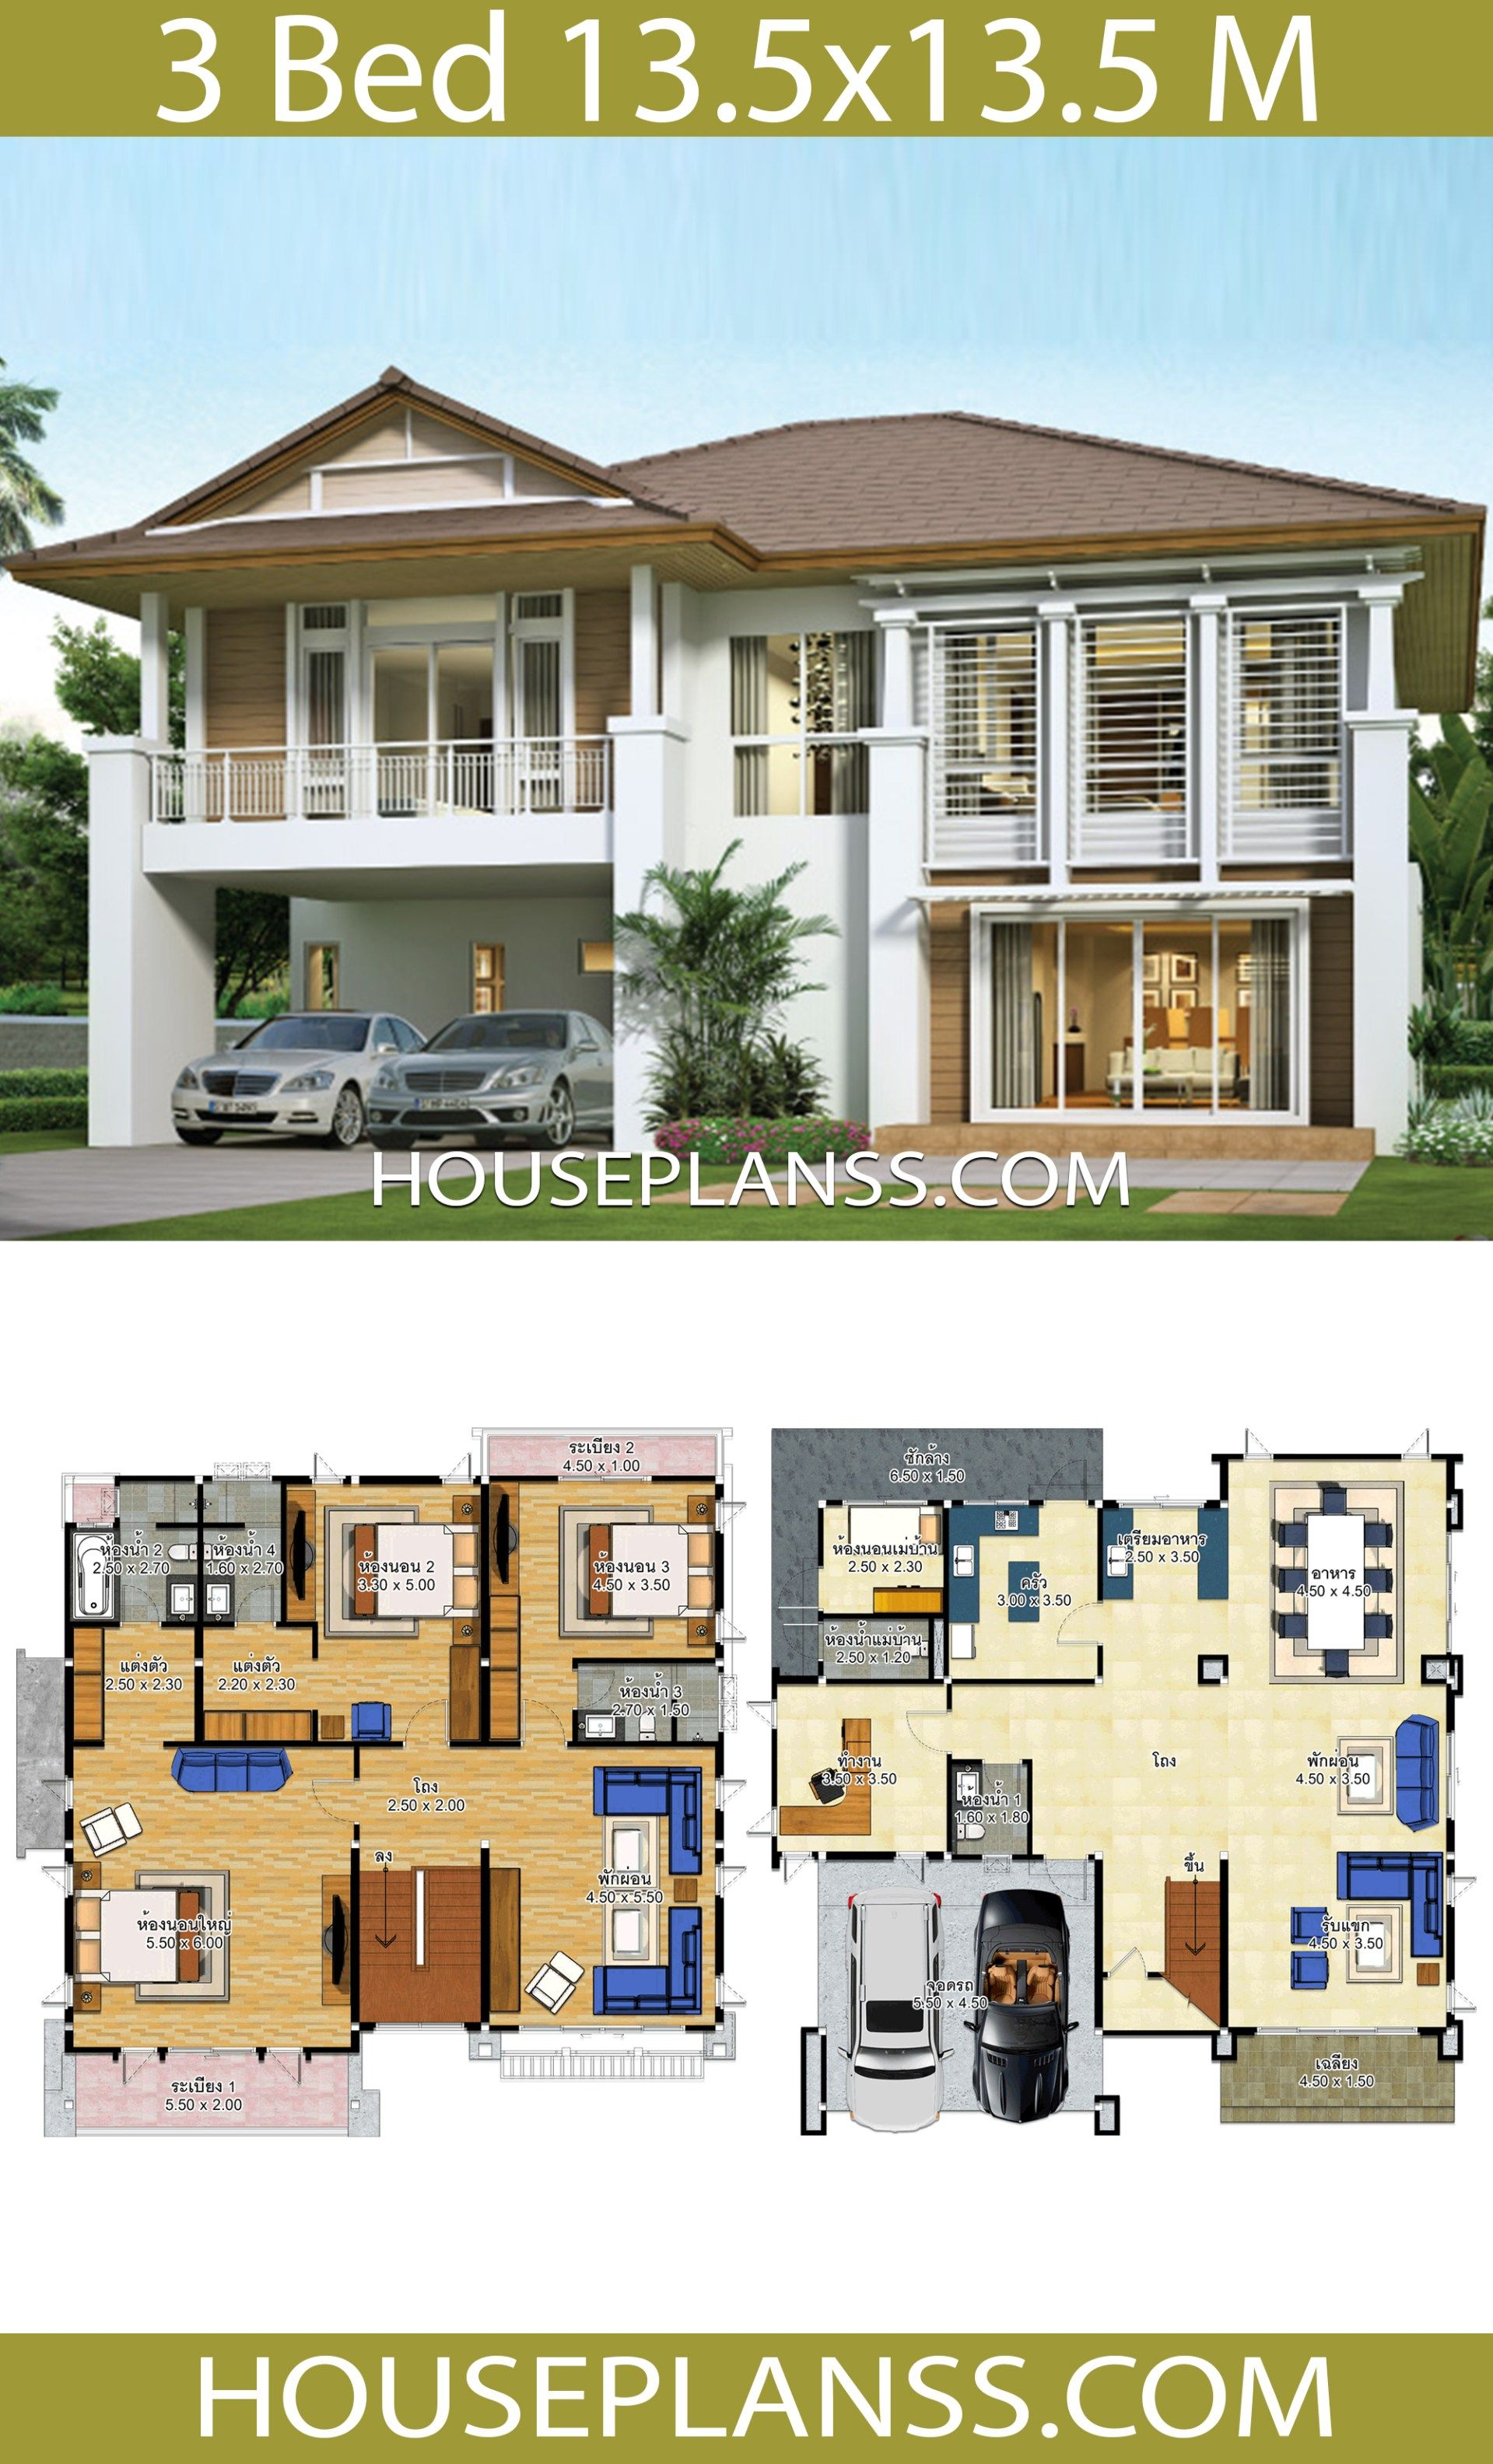 House Design Idea 13 5x13 5 With 3 Bedrooms House Plans 3d Model House Plan Architectural House Plans Kerala House Design